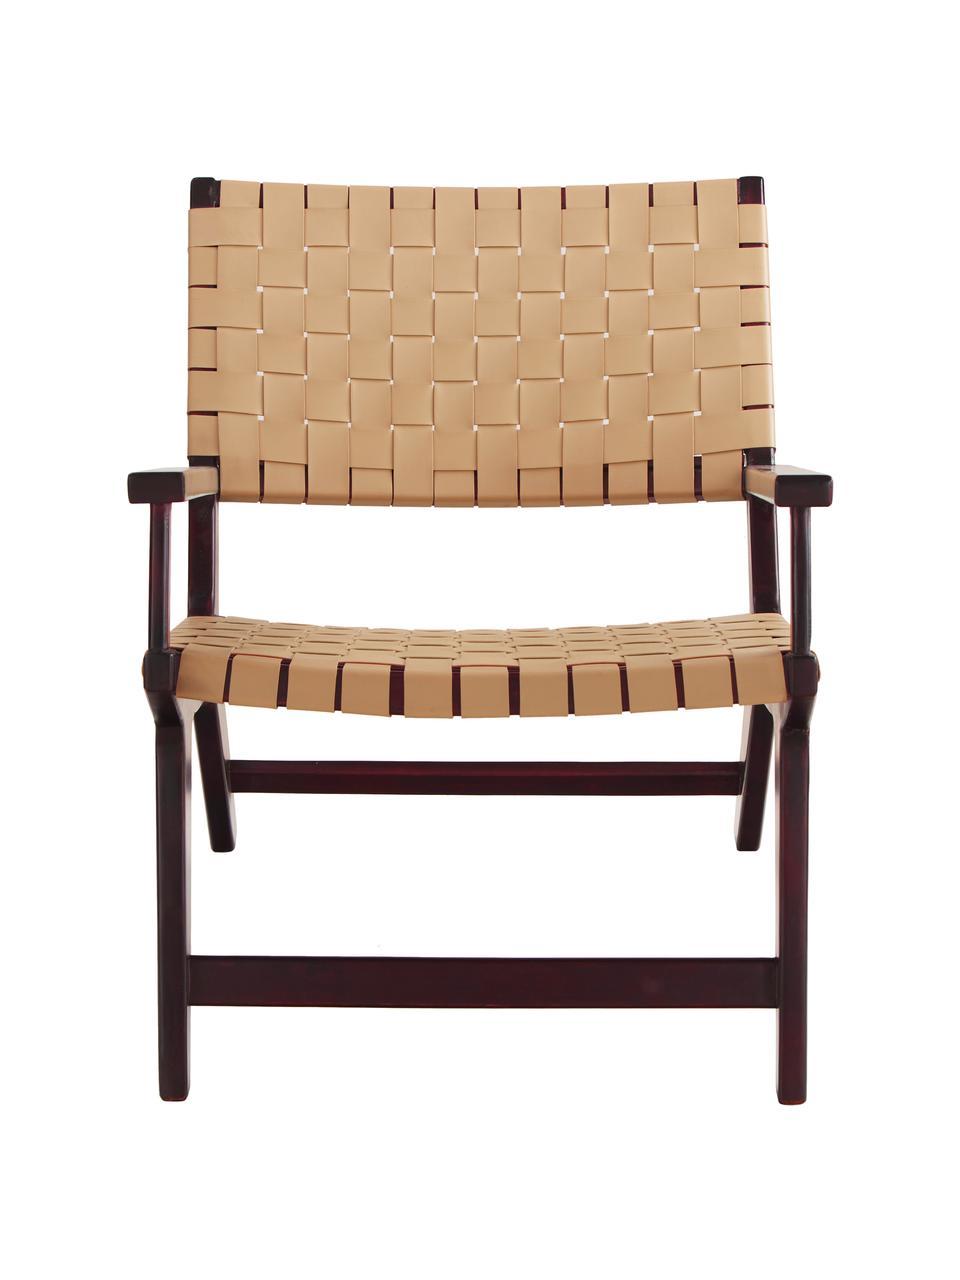 Kunstleder-Sessel Akina in Beige, Sitzfläche: Kunstleder (100% Polyuret, Gestell: Massives Akazienholz, lac, Beige, B 62 x T 74 cm